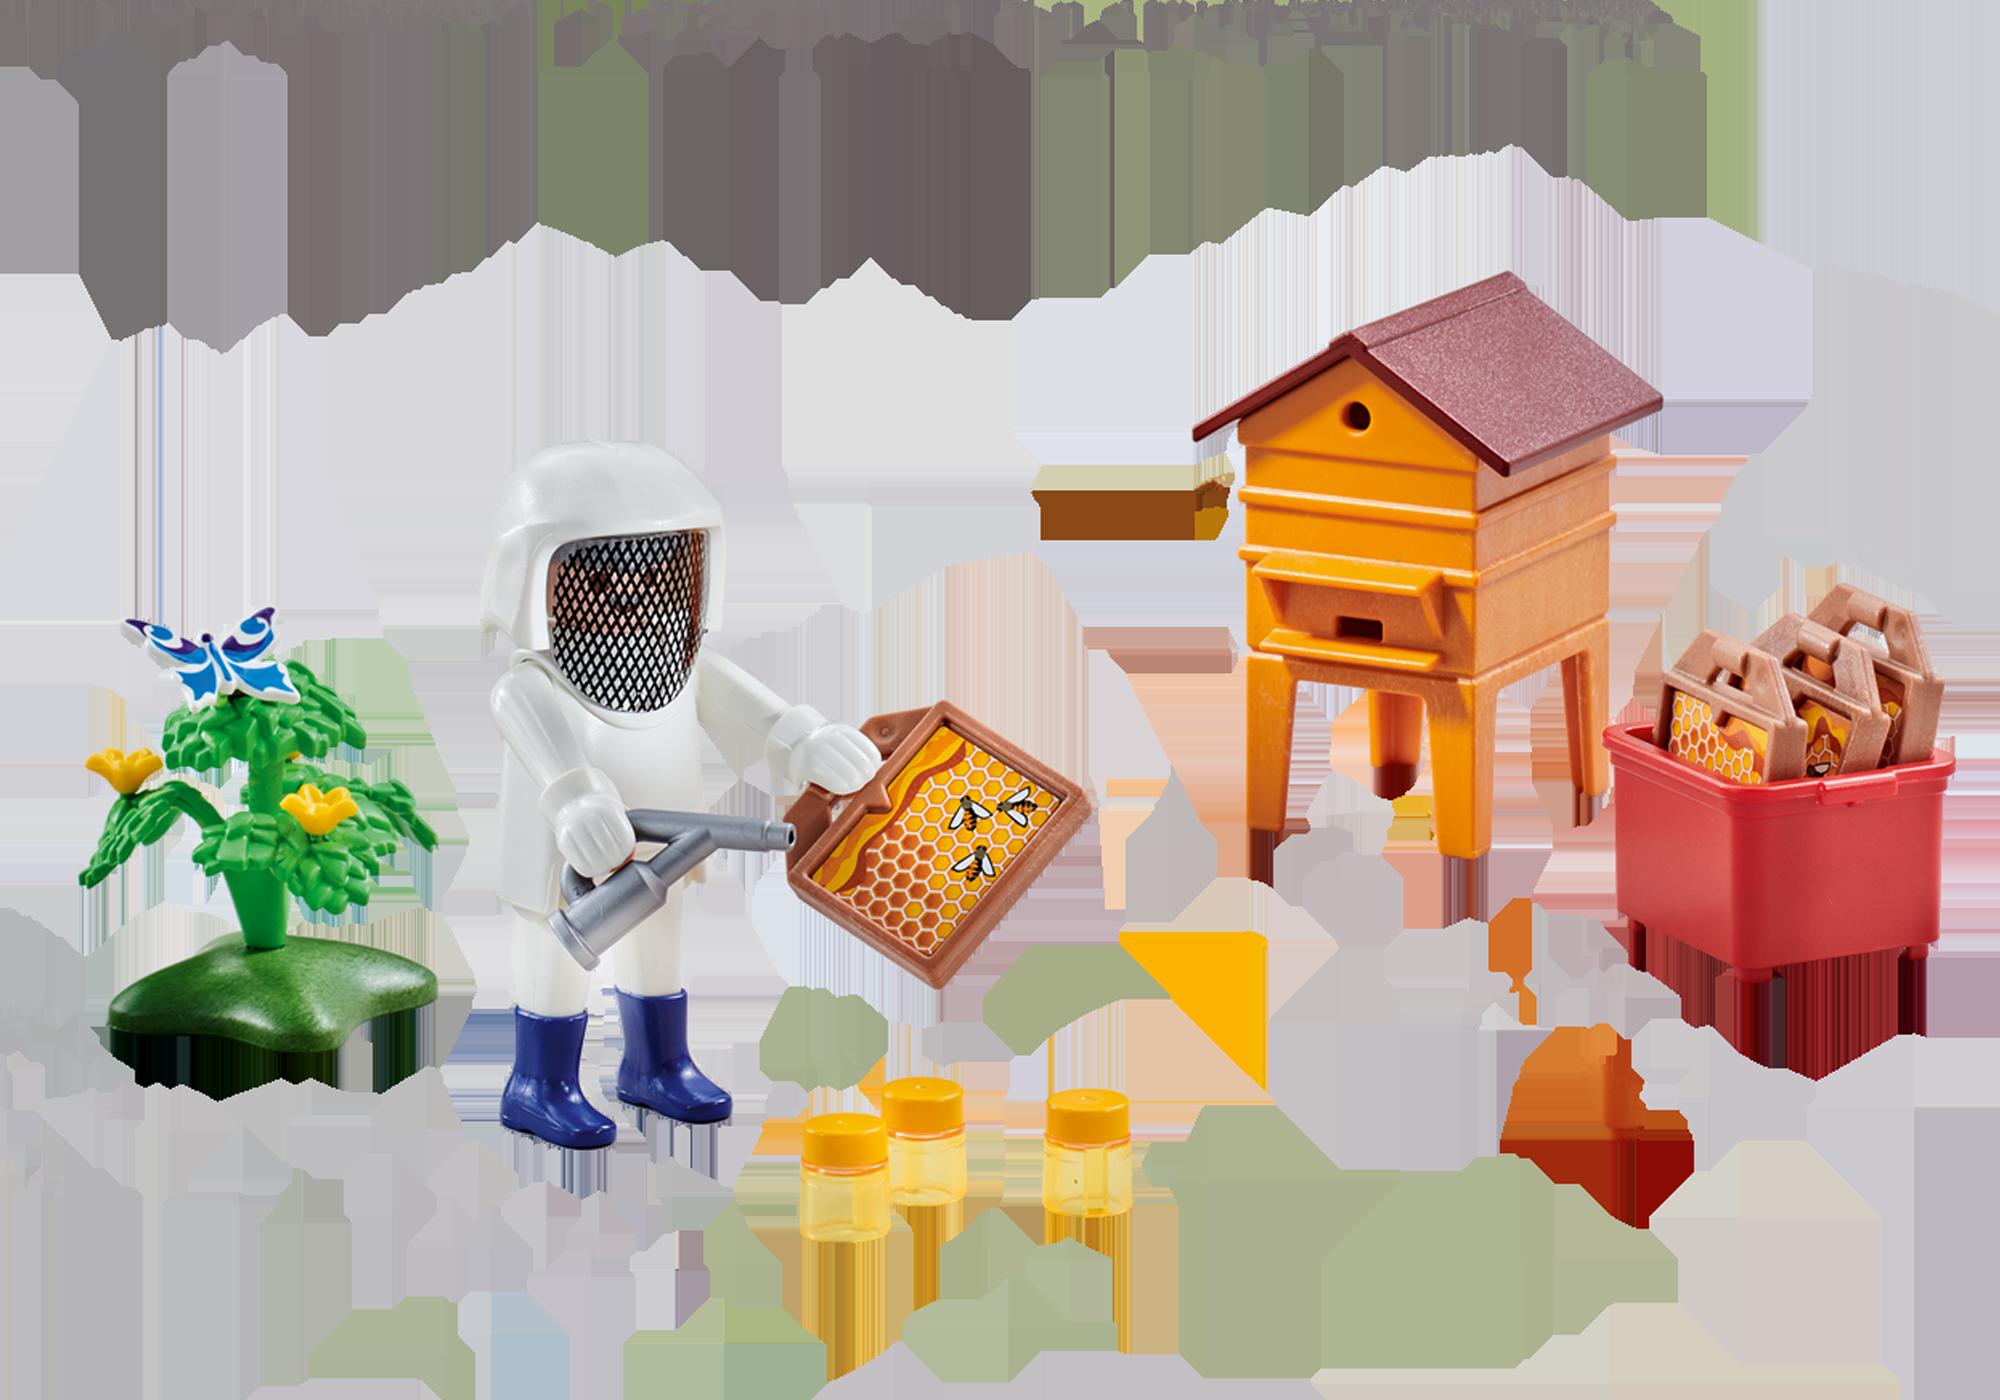 6573_product_detail/Imker mit Bienenstock